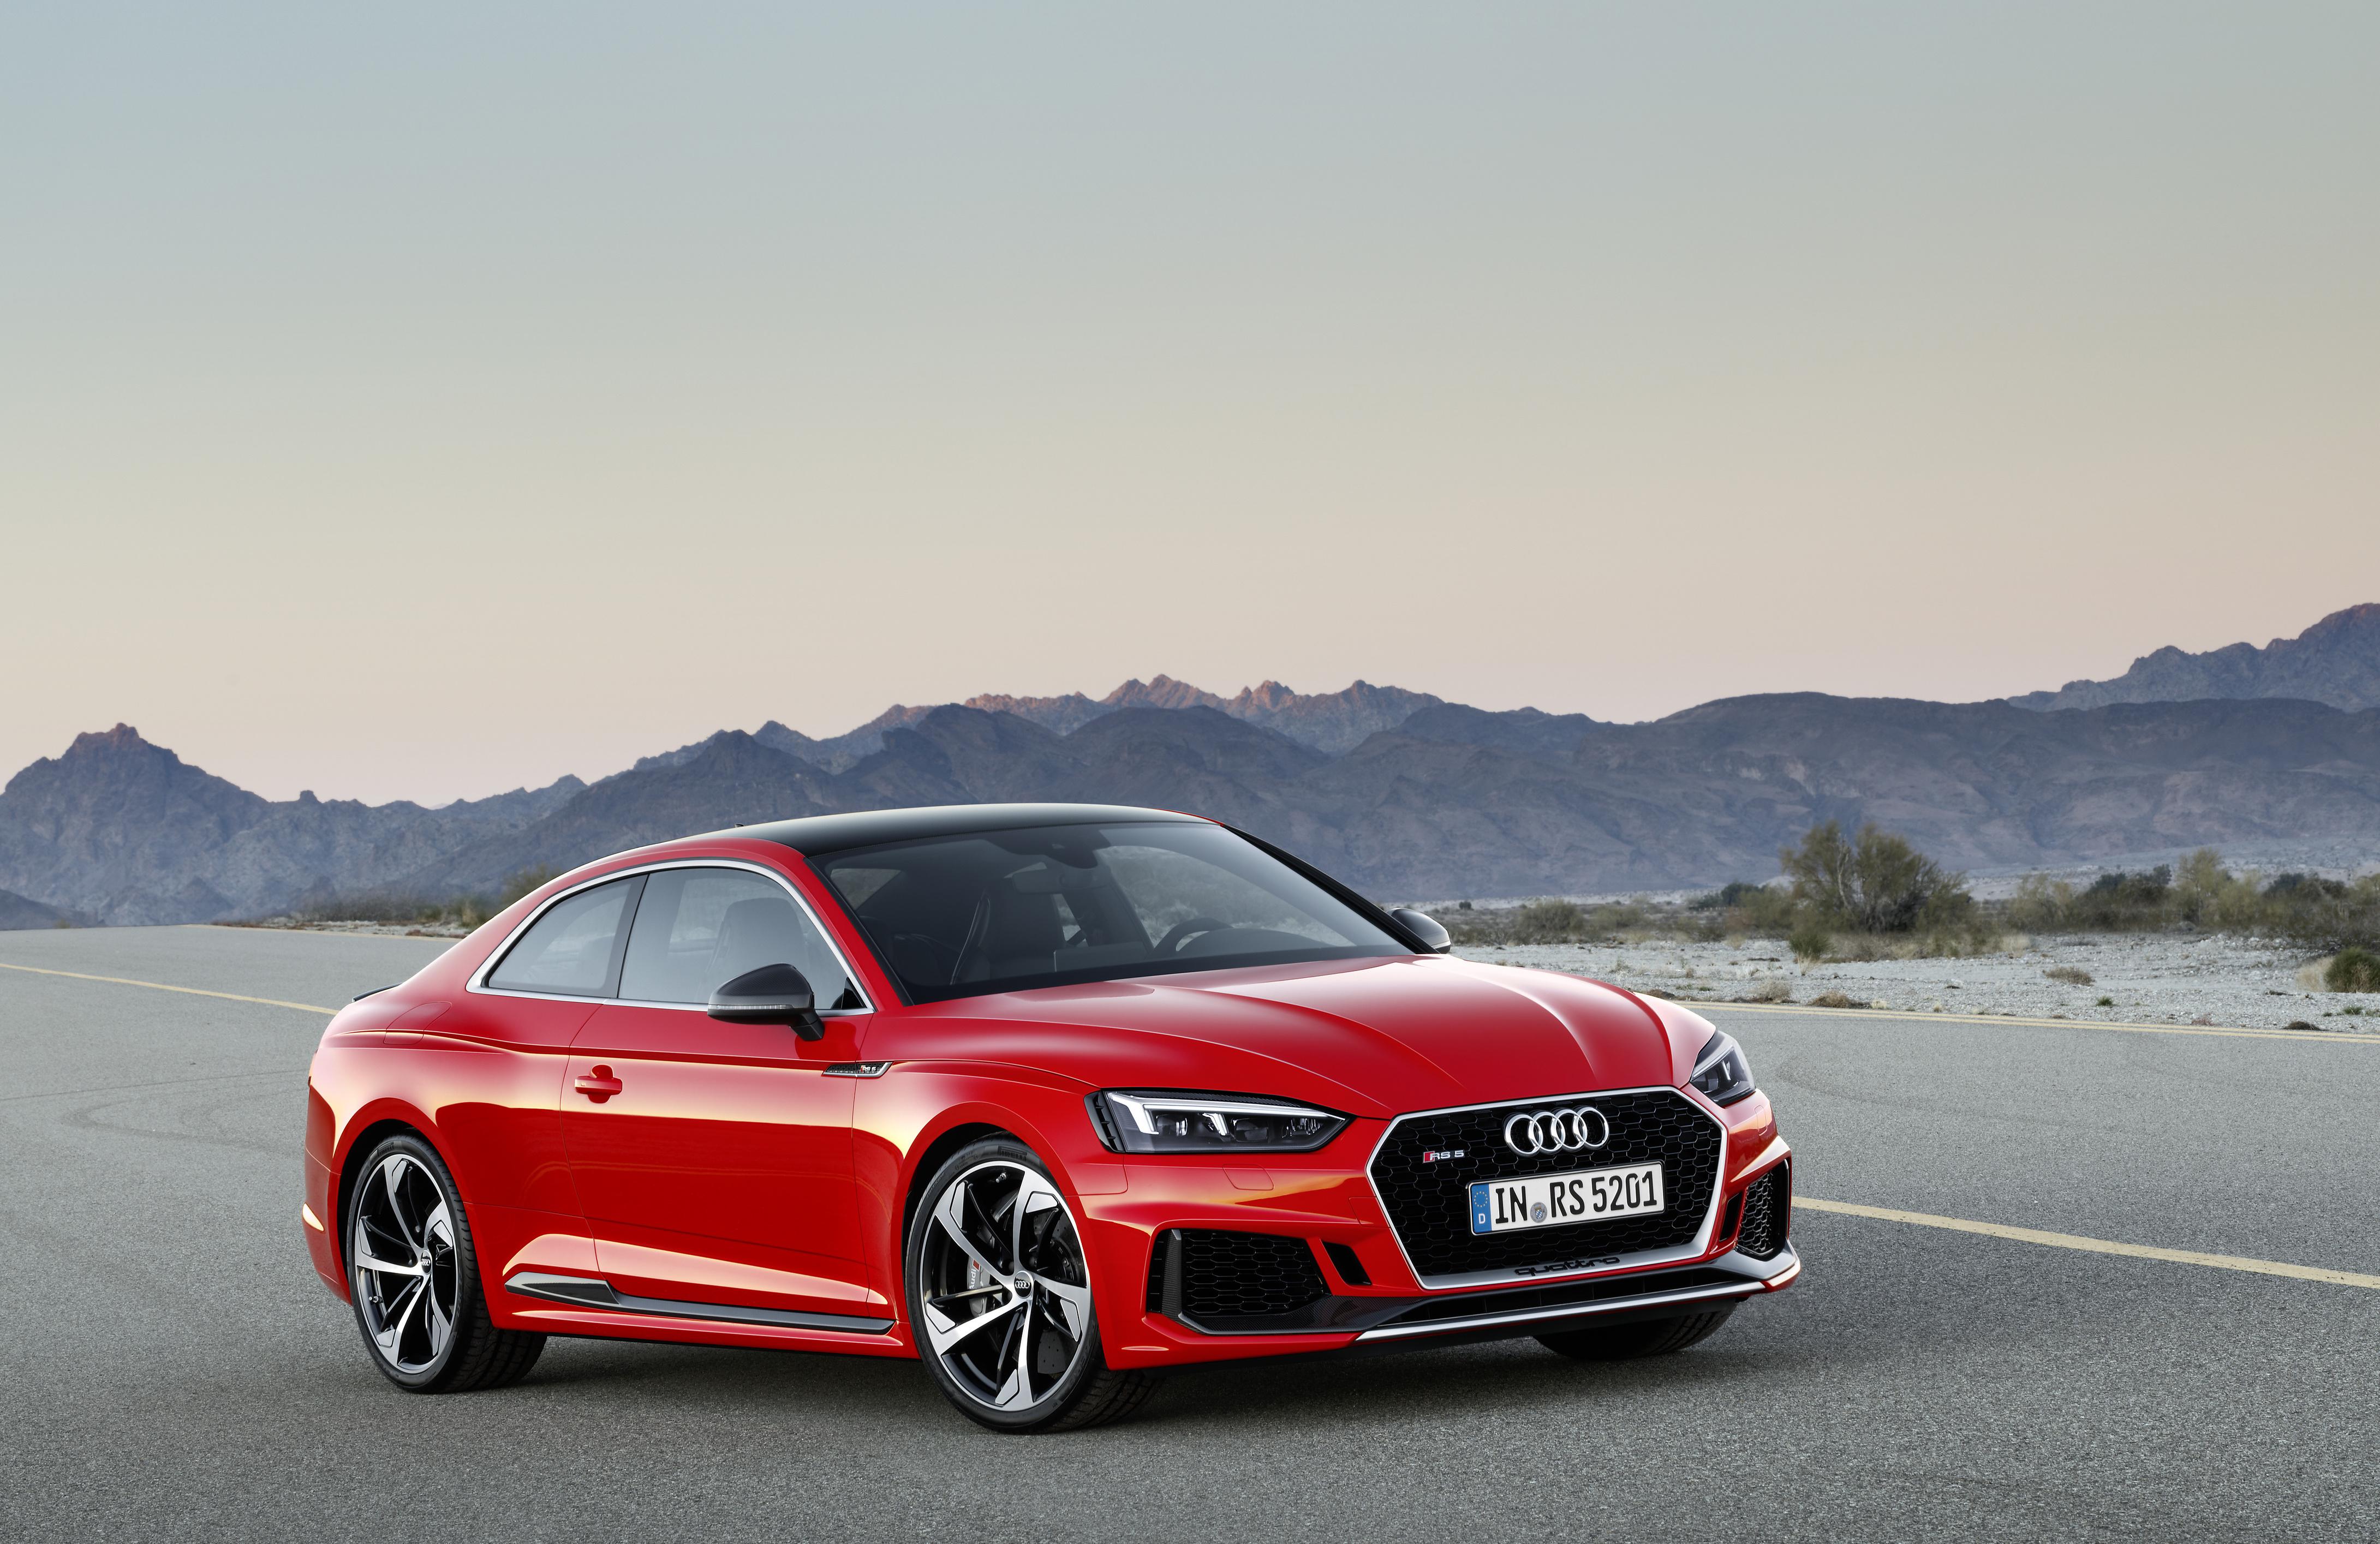 Llega a México el RS 5 Coupé, el nuevo superdeportivo de Audi